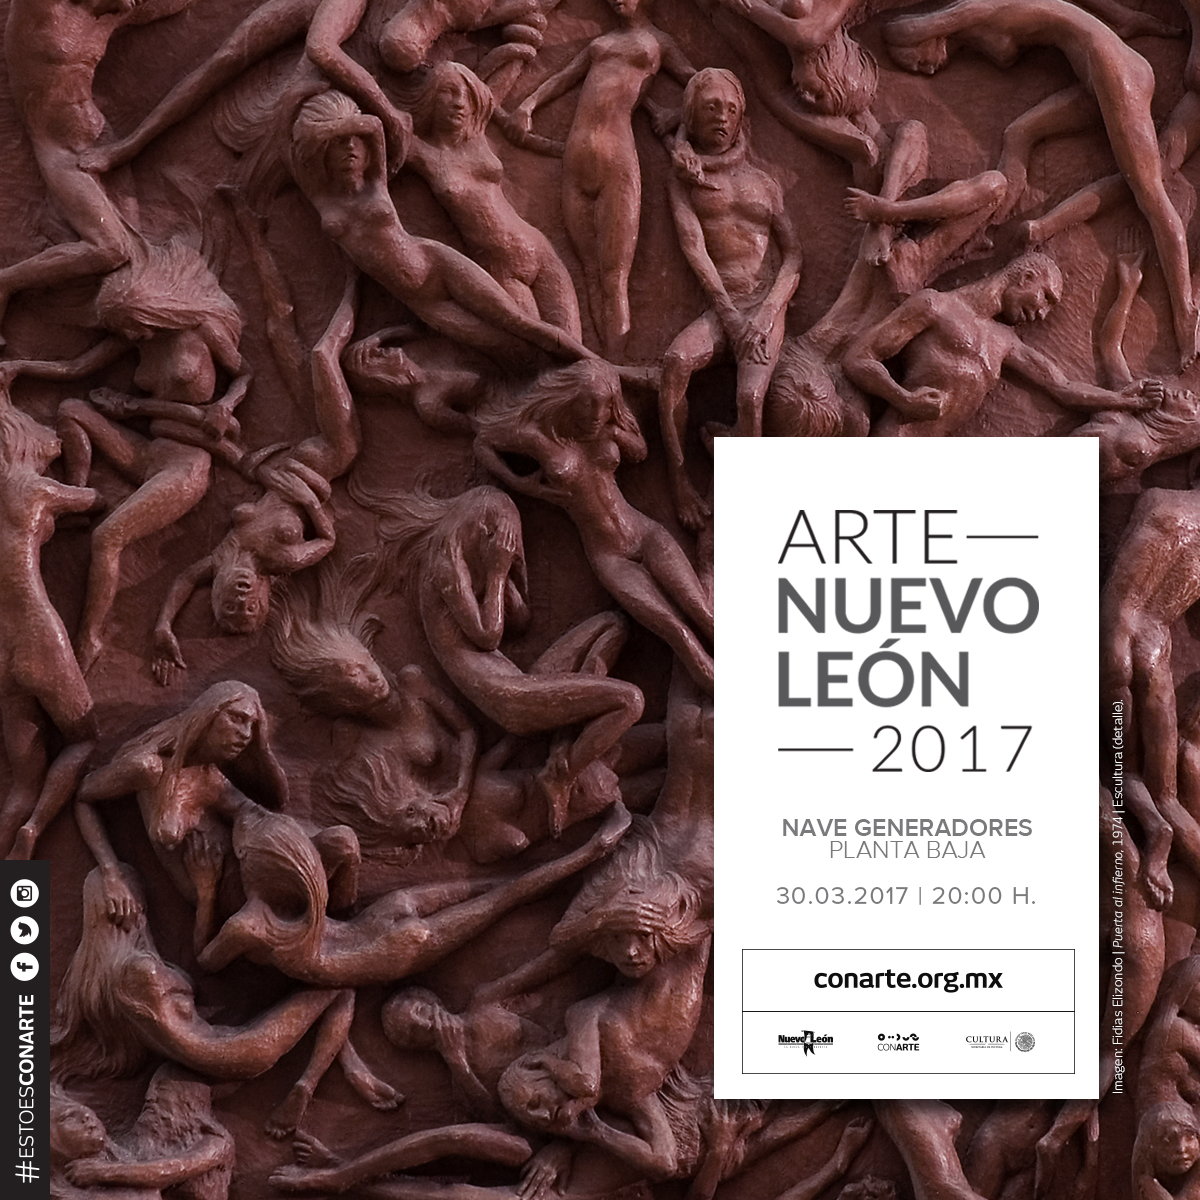 wf_arte-nuevo-leon-2